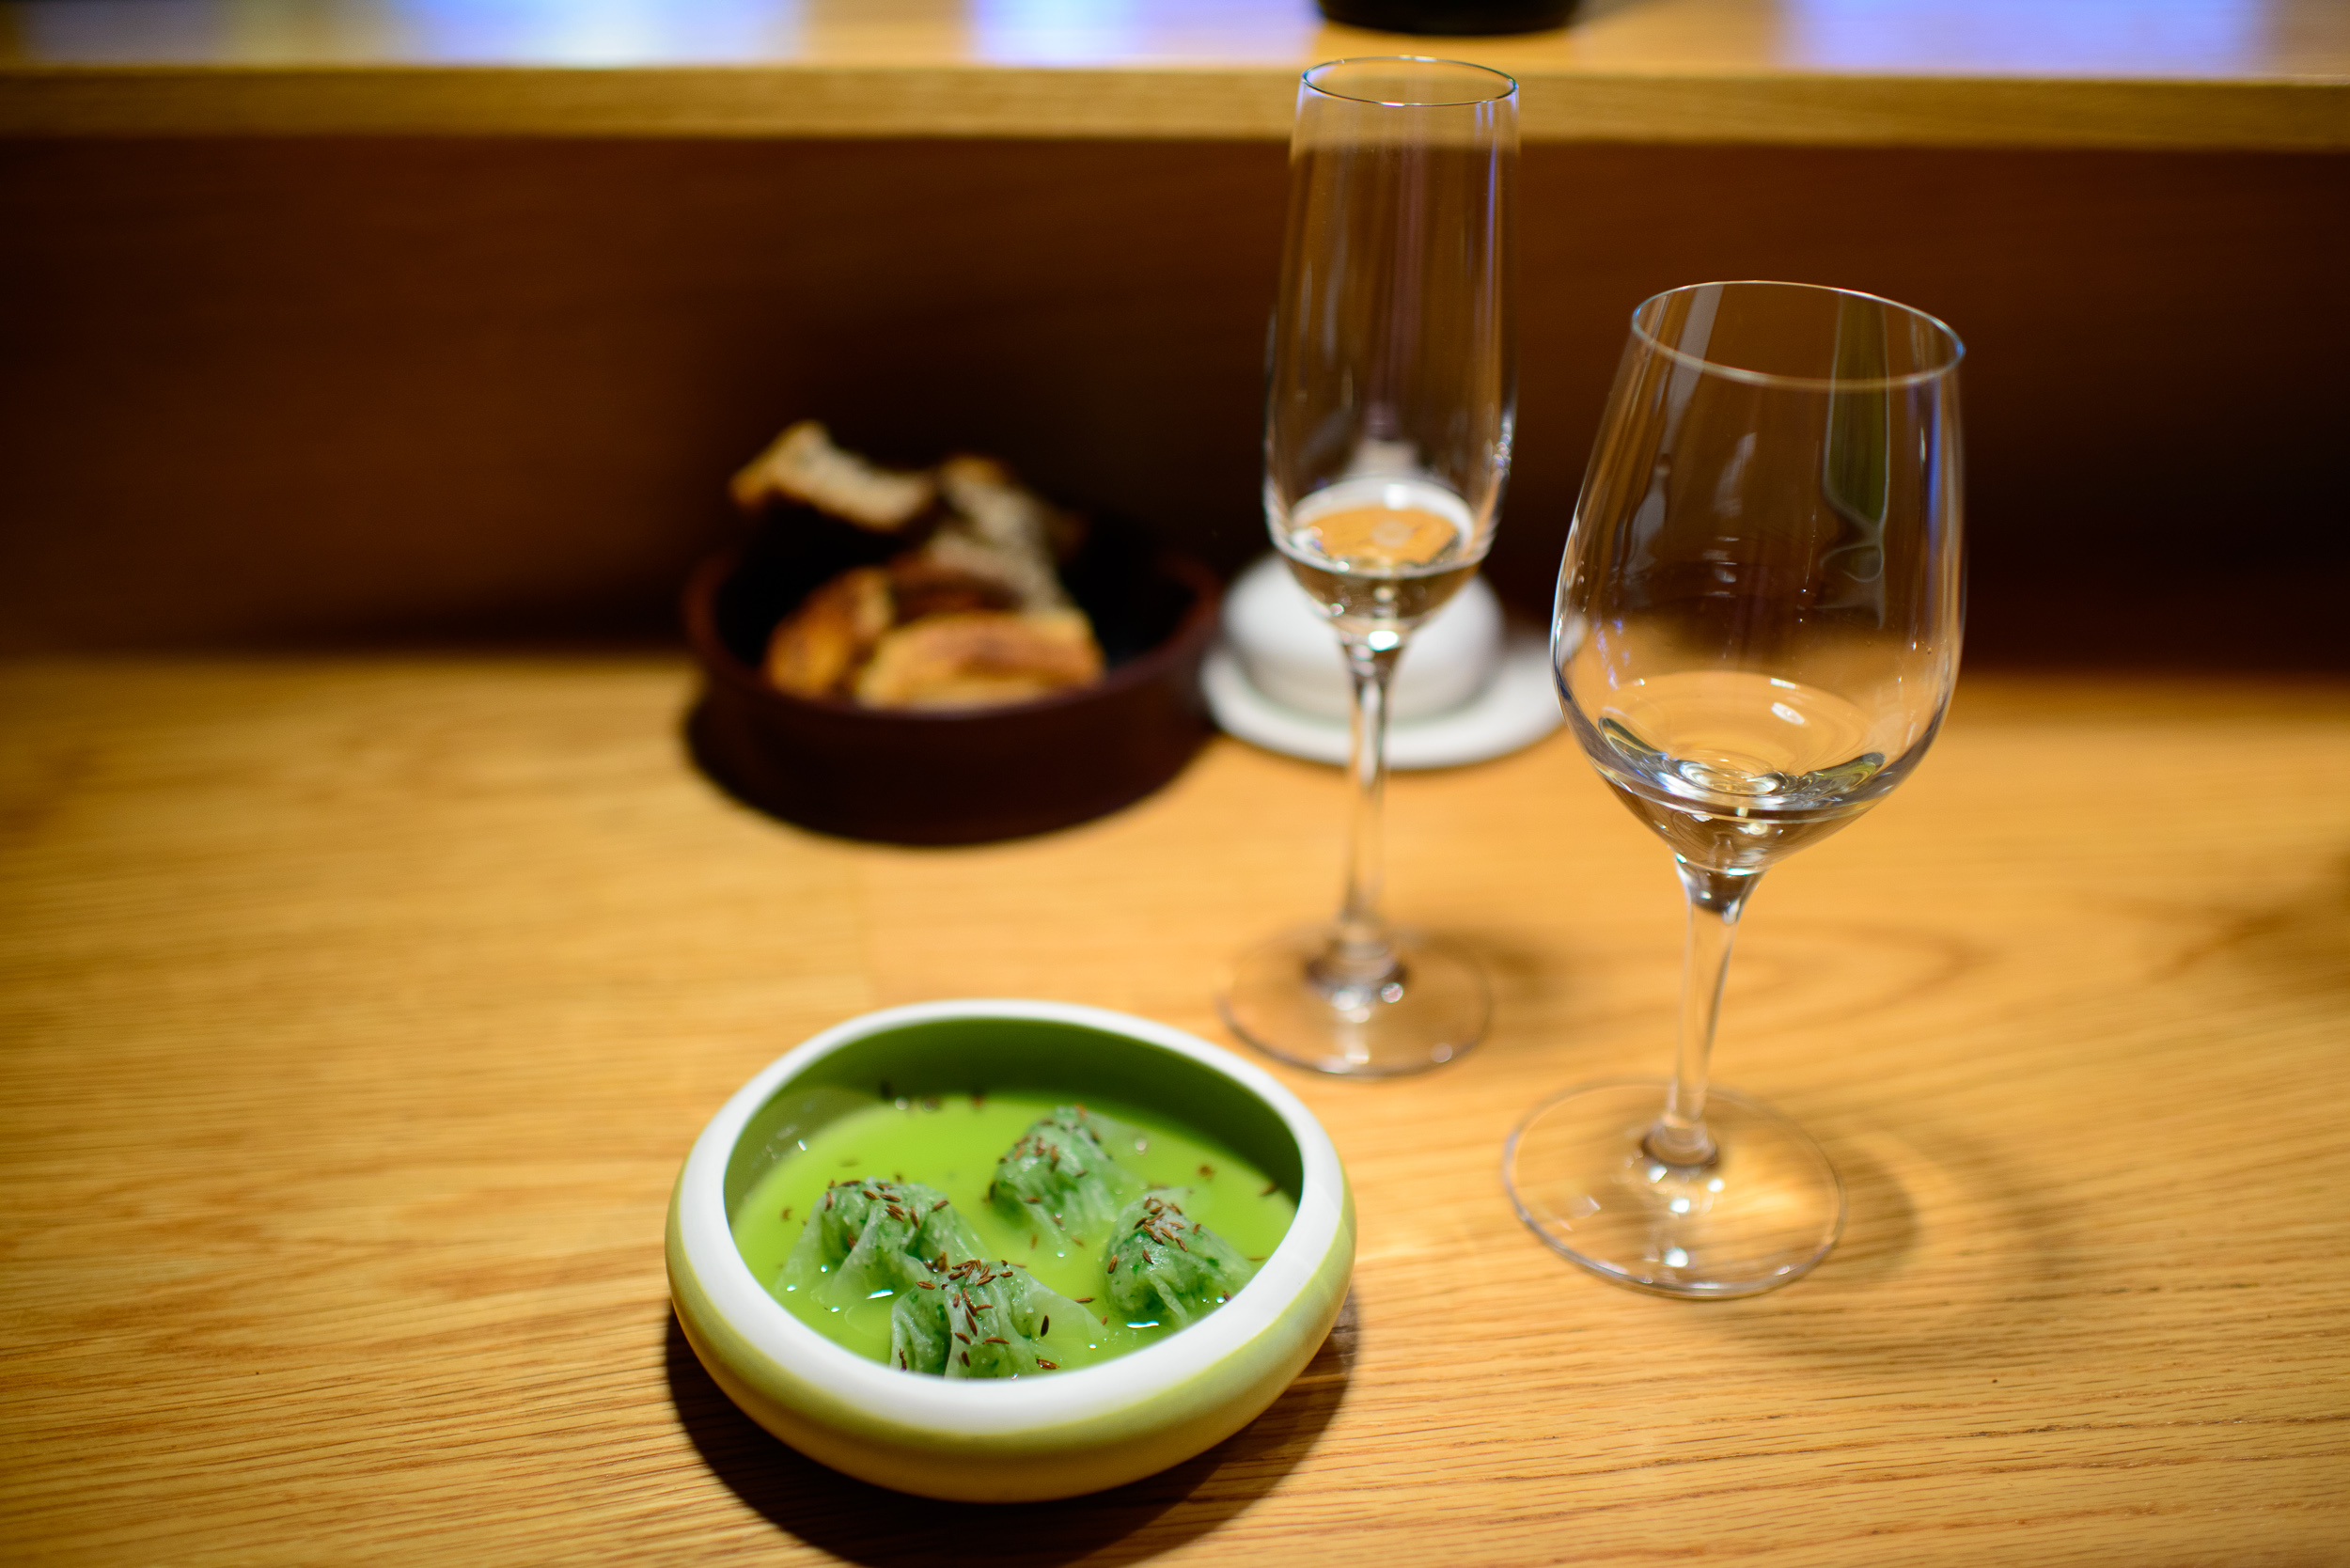 2nd Course: Kohlrabi ravioli, cucumber, toasted caraway seeds, b